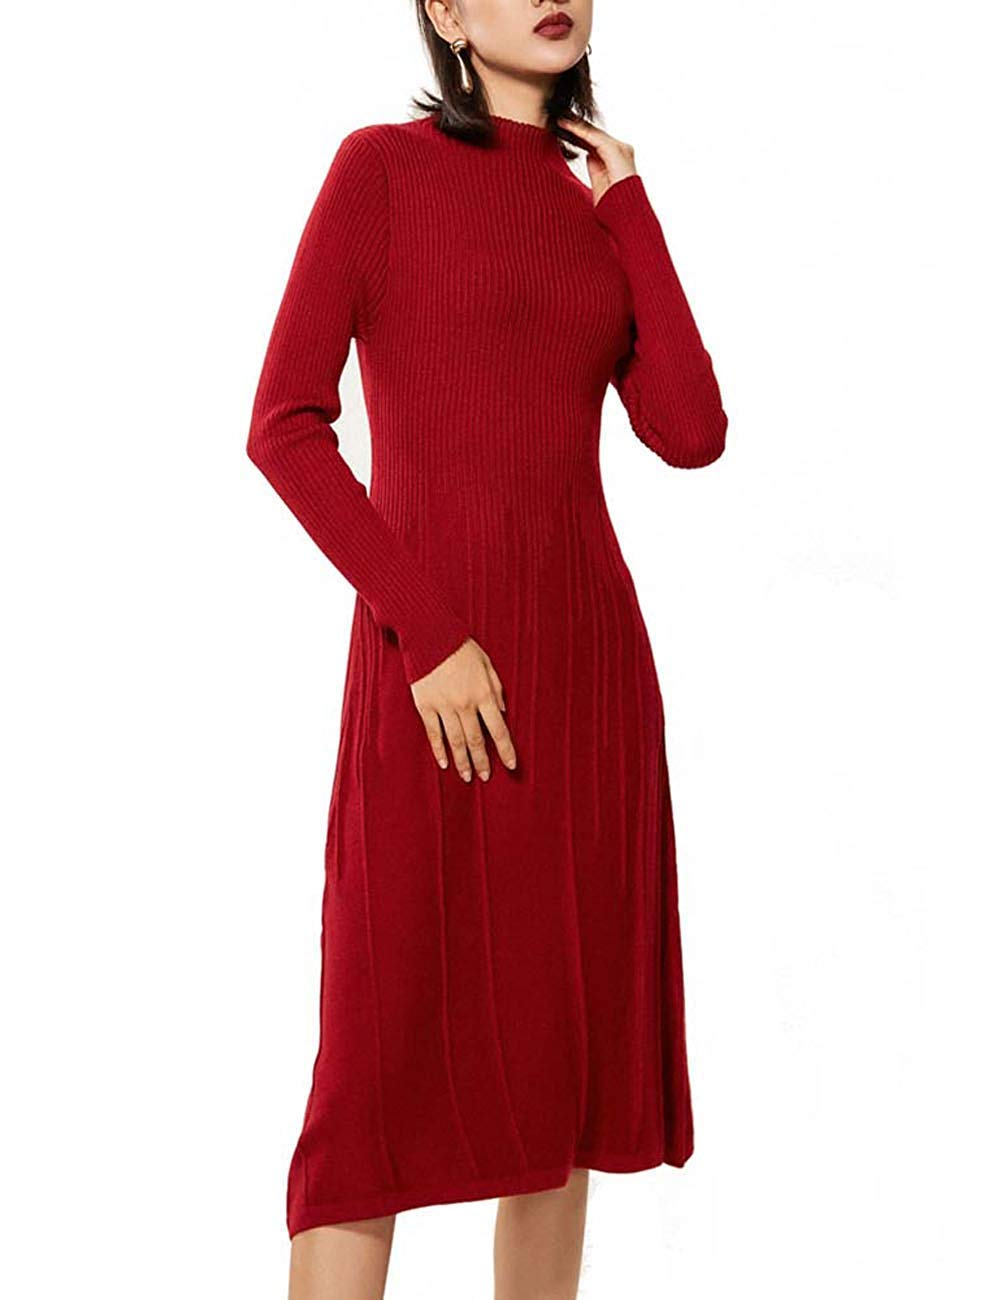 e4bf4095e12 50% discount on RanRui Midi Dress Womens Knitted V Neck Cashmere ...